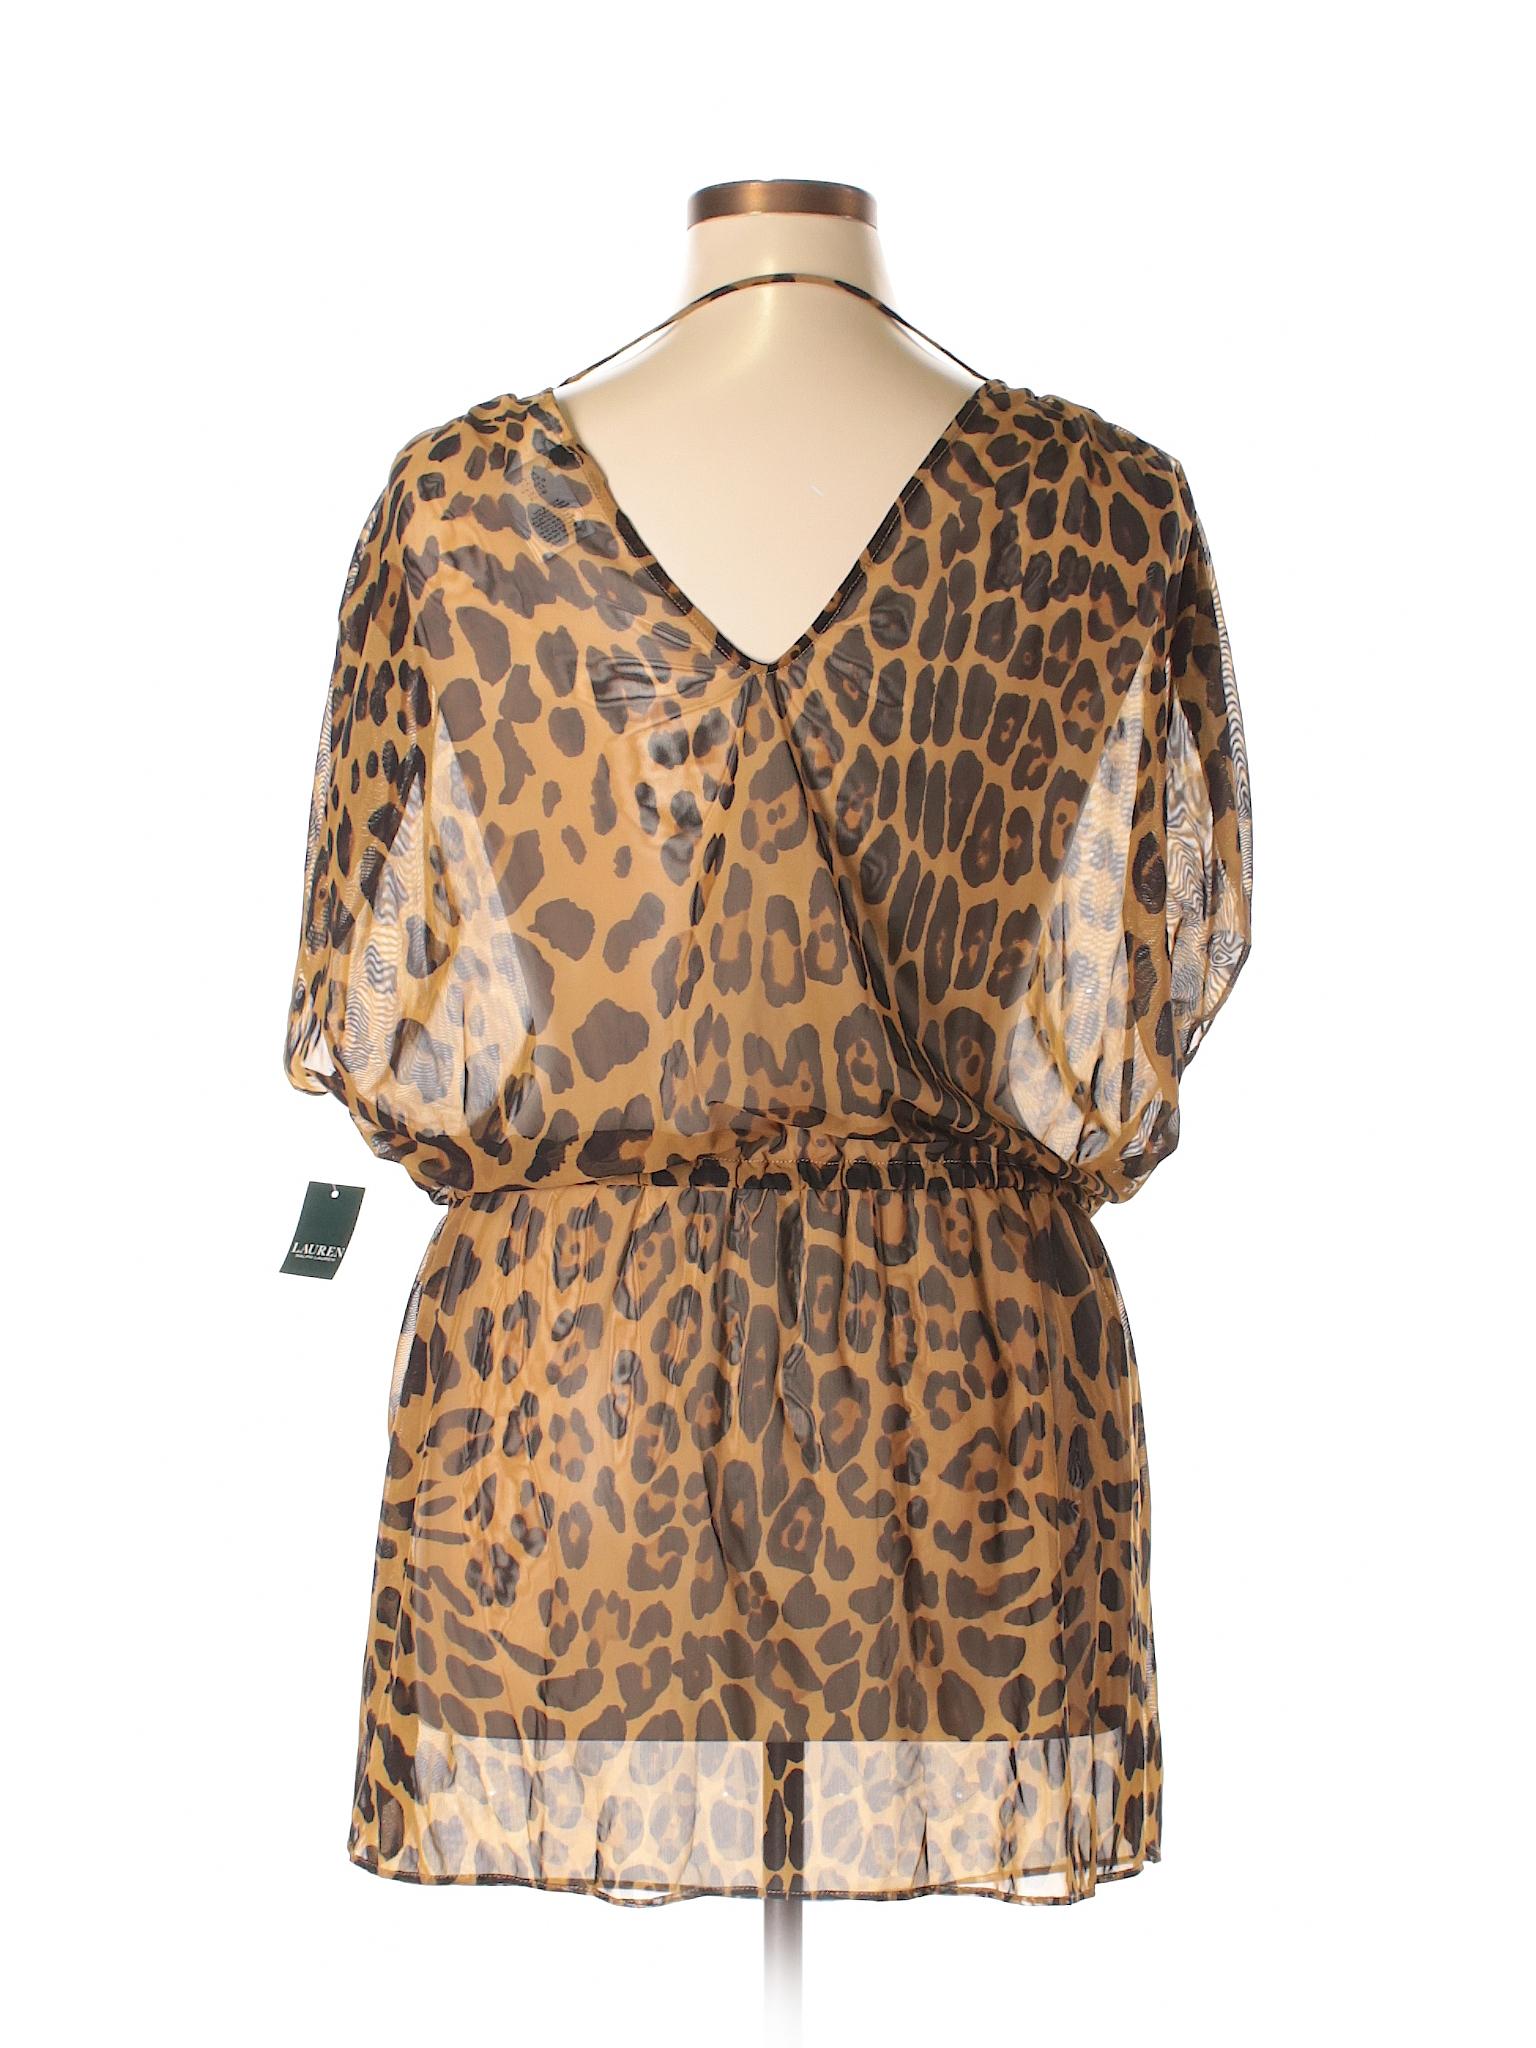 Lauren Ralph Swimsuit Boutique Lauren Cover Up by CaxtFntq